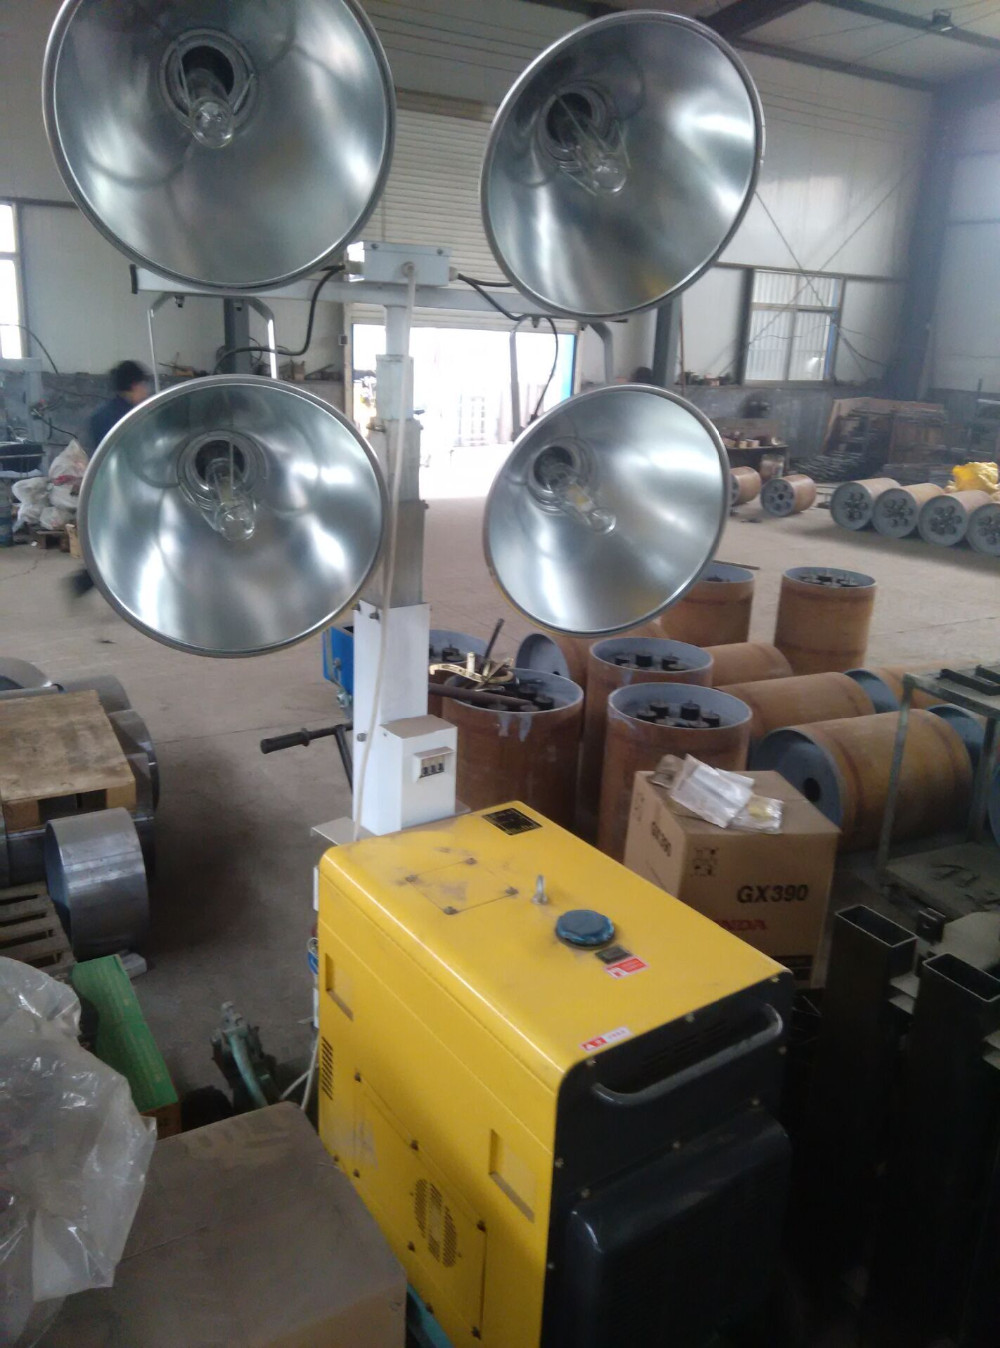 Flood lights for construction : Portable construction led flood lights mobile light tower